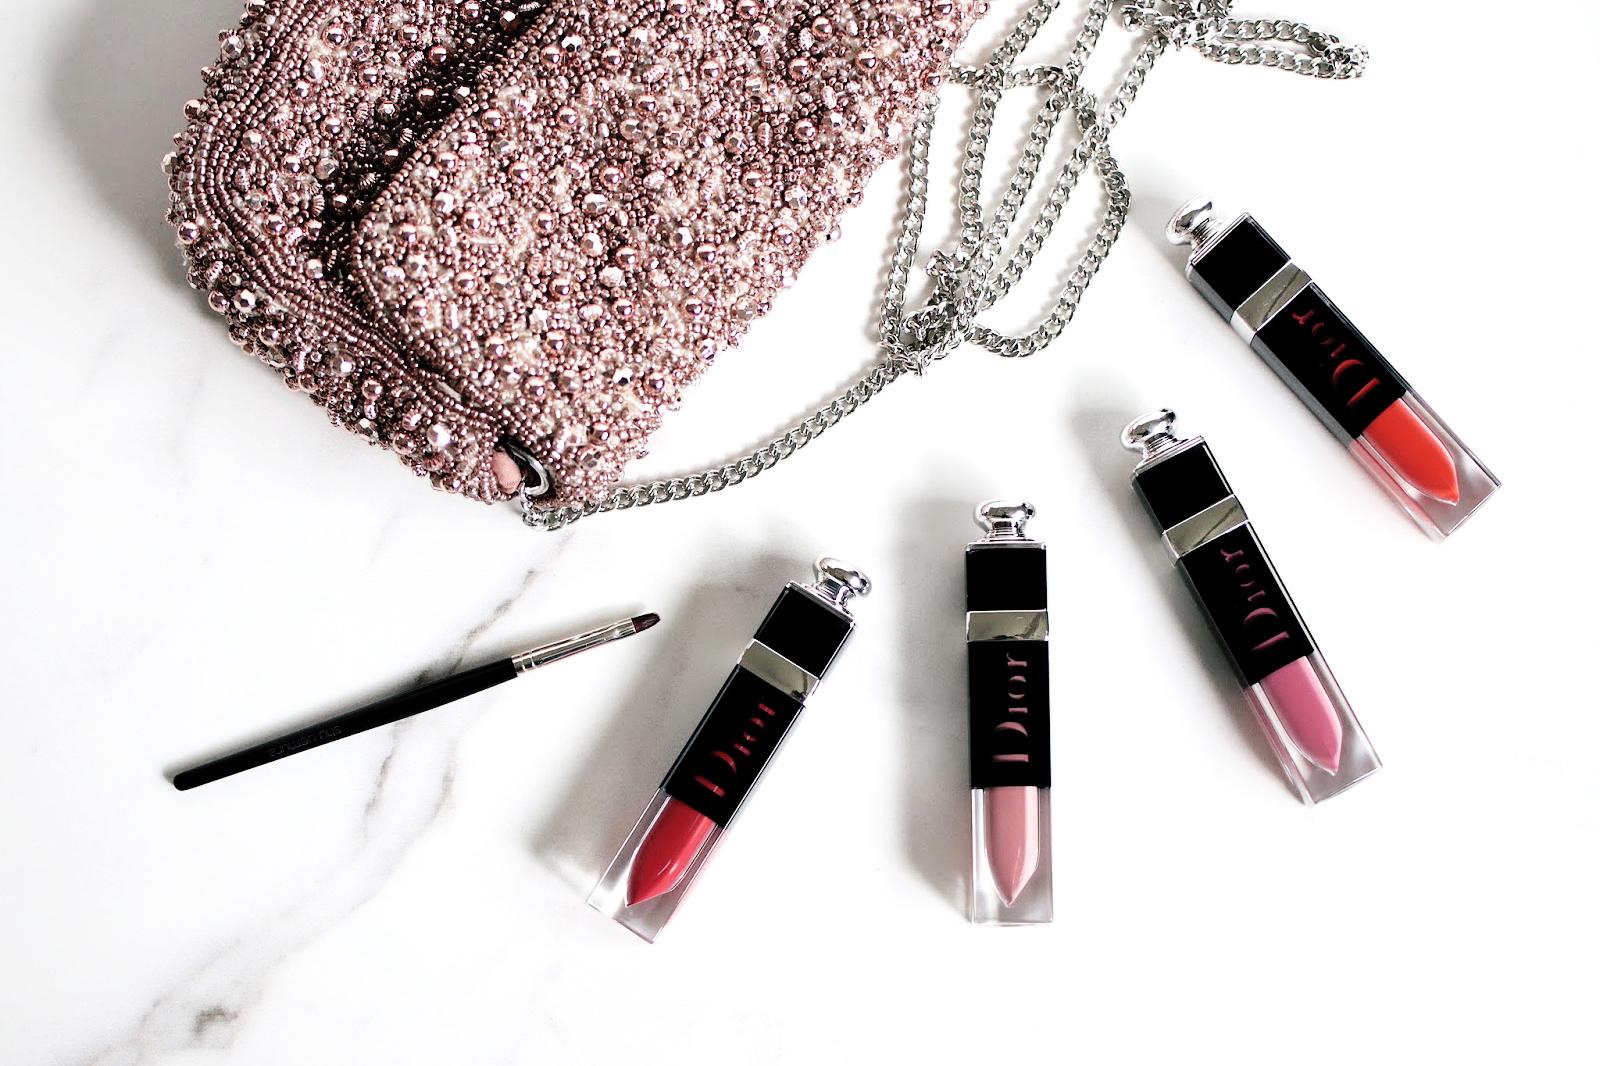 dior addict laquer plump vernis rouge à lèvres avis test swatch swatches